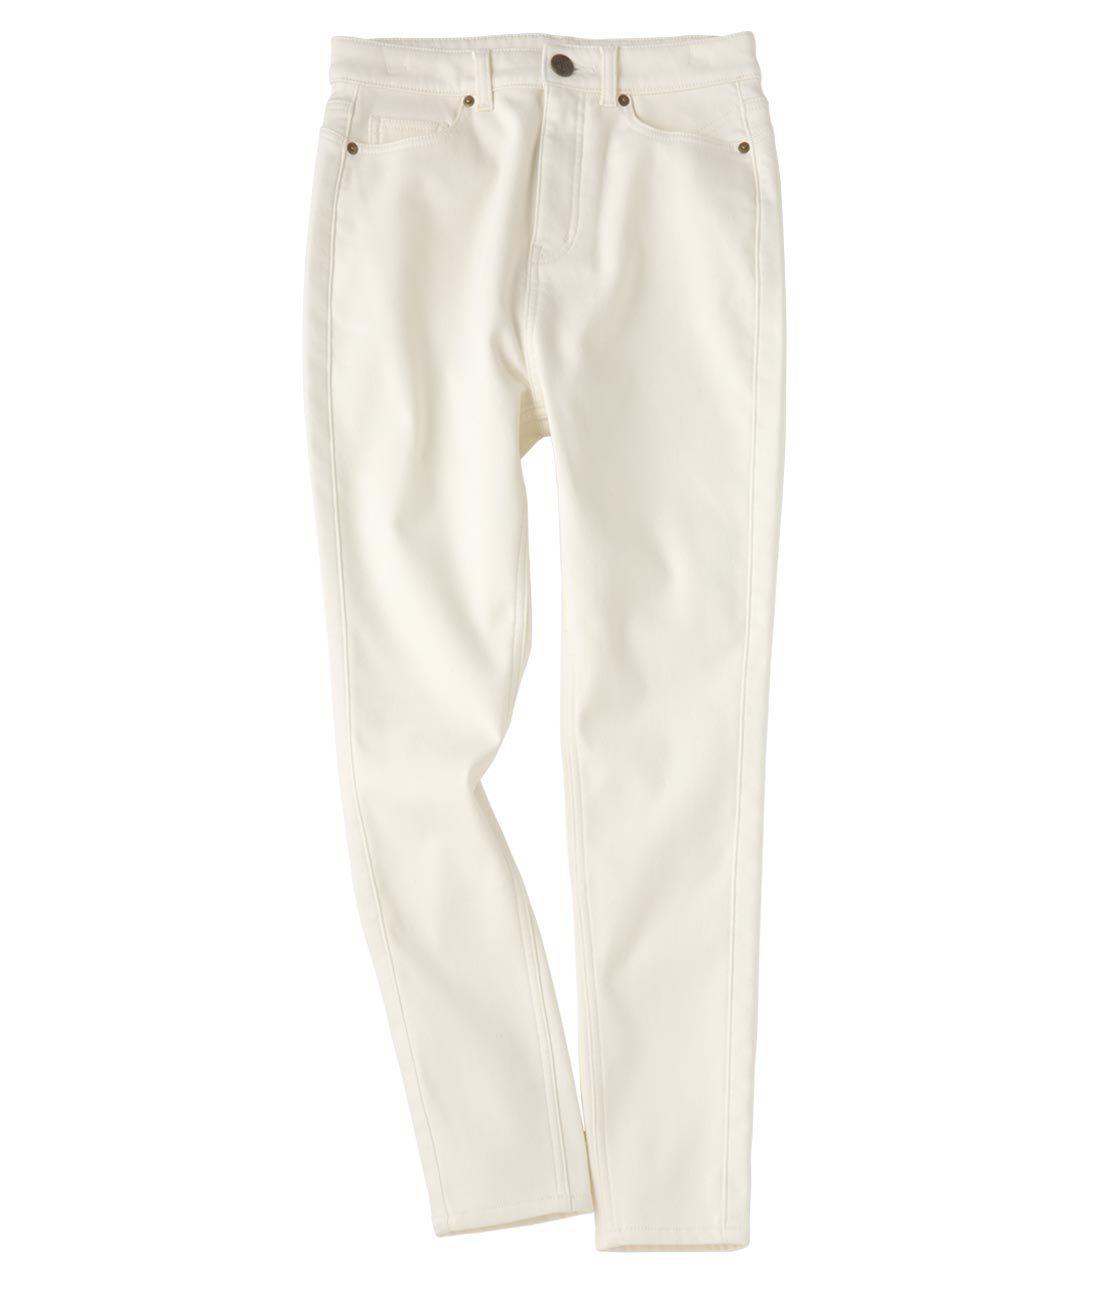 Back fleece legs high waist skinny pants